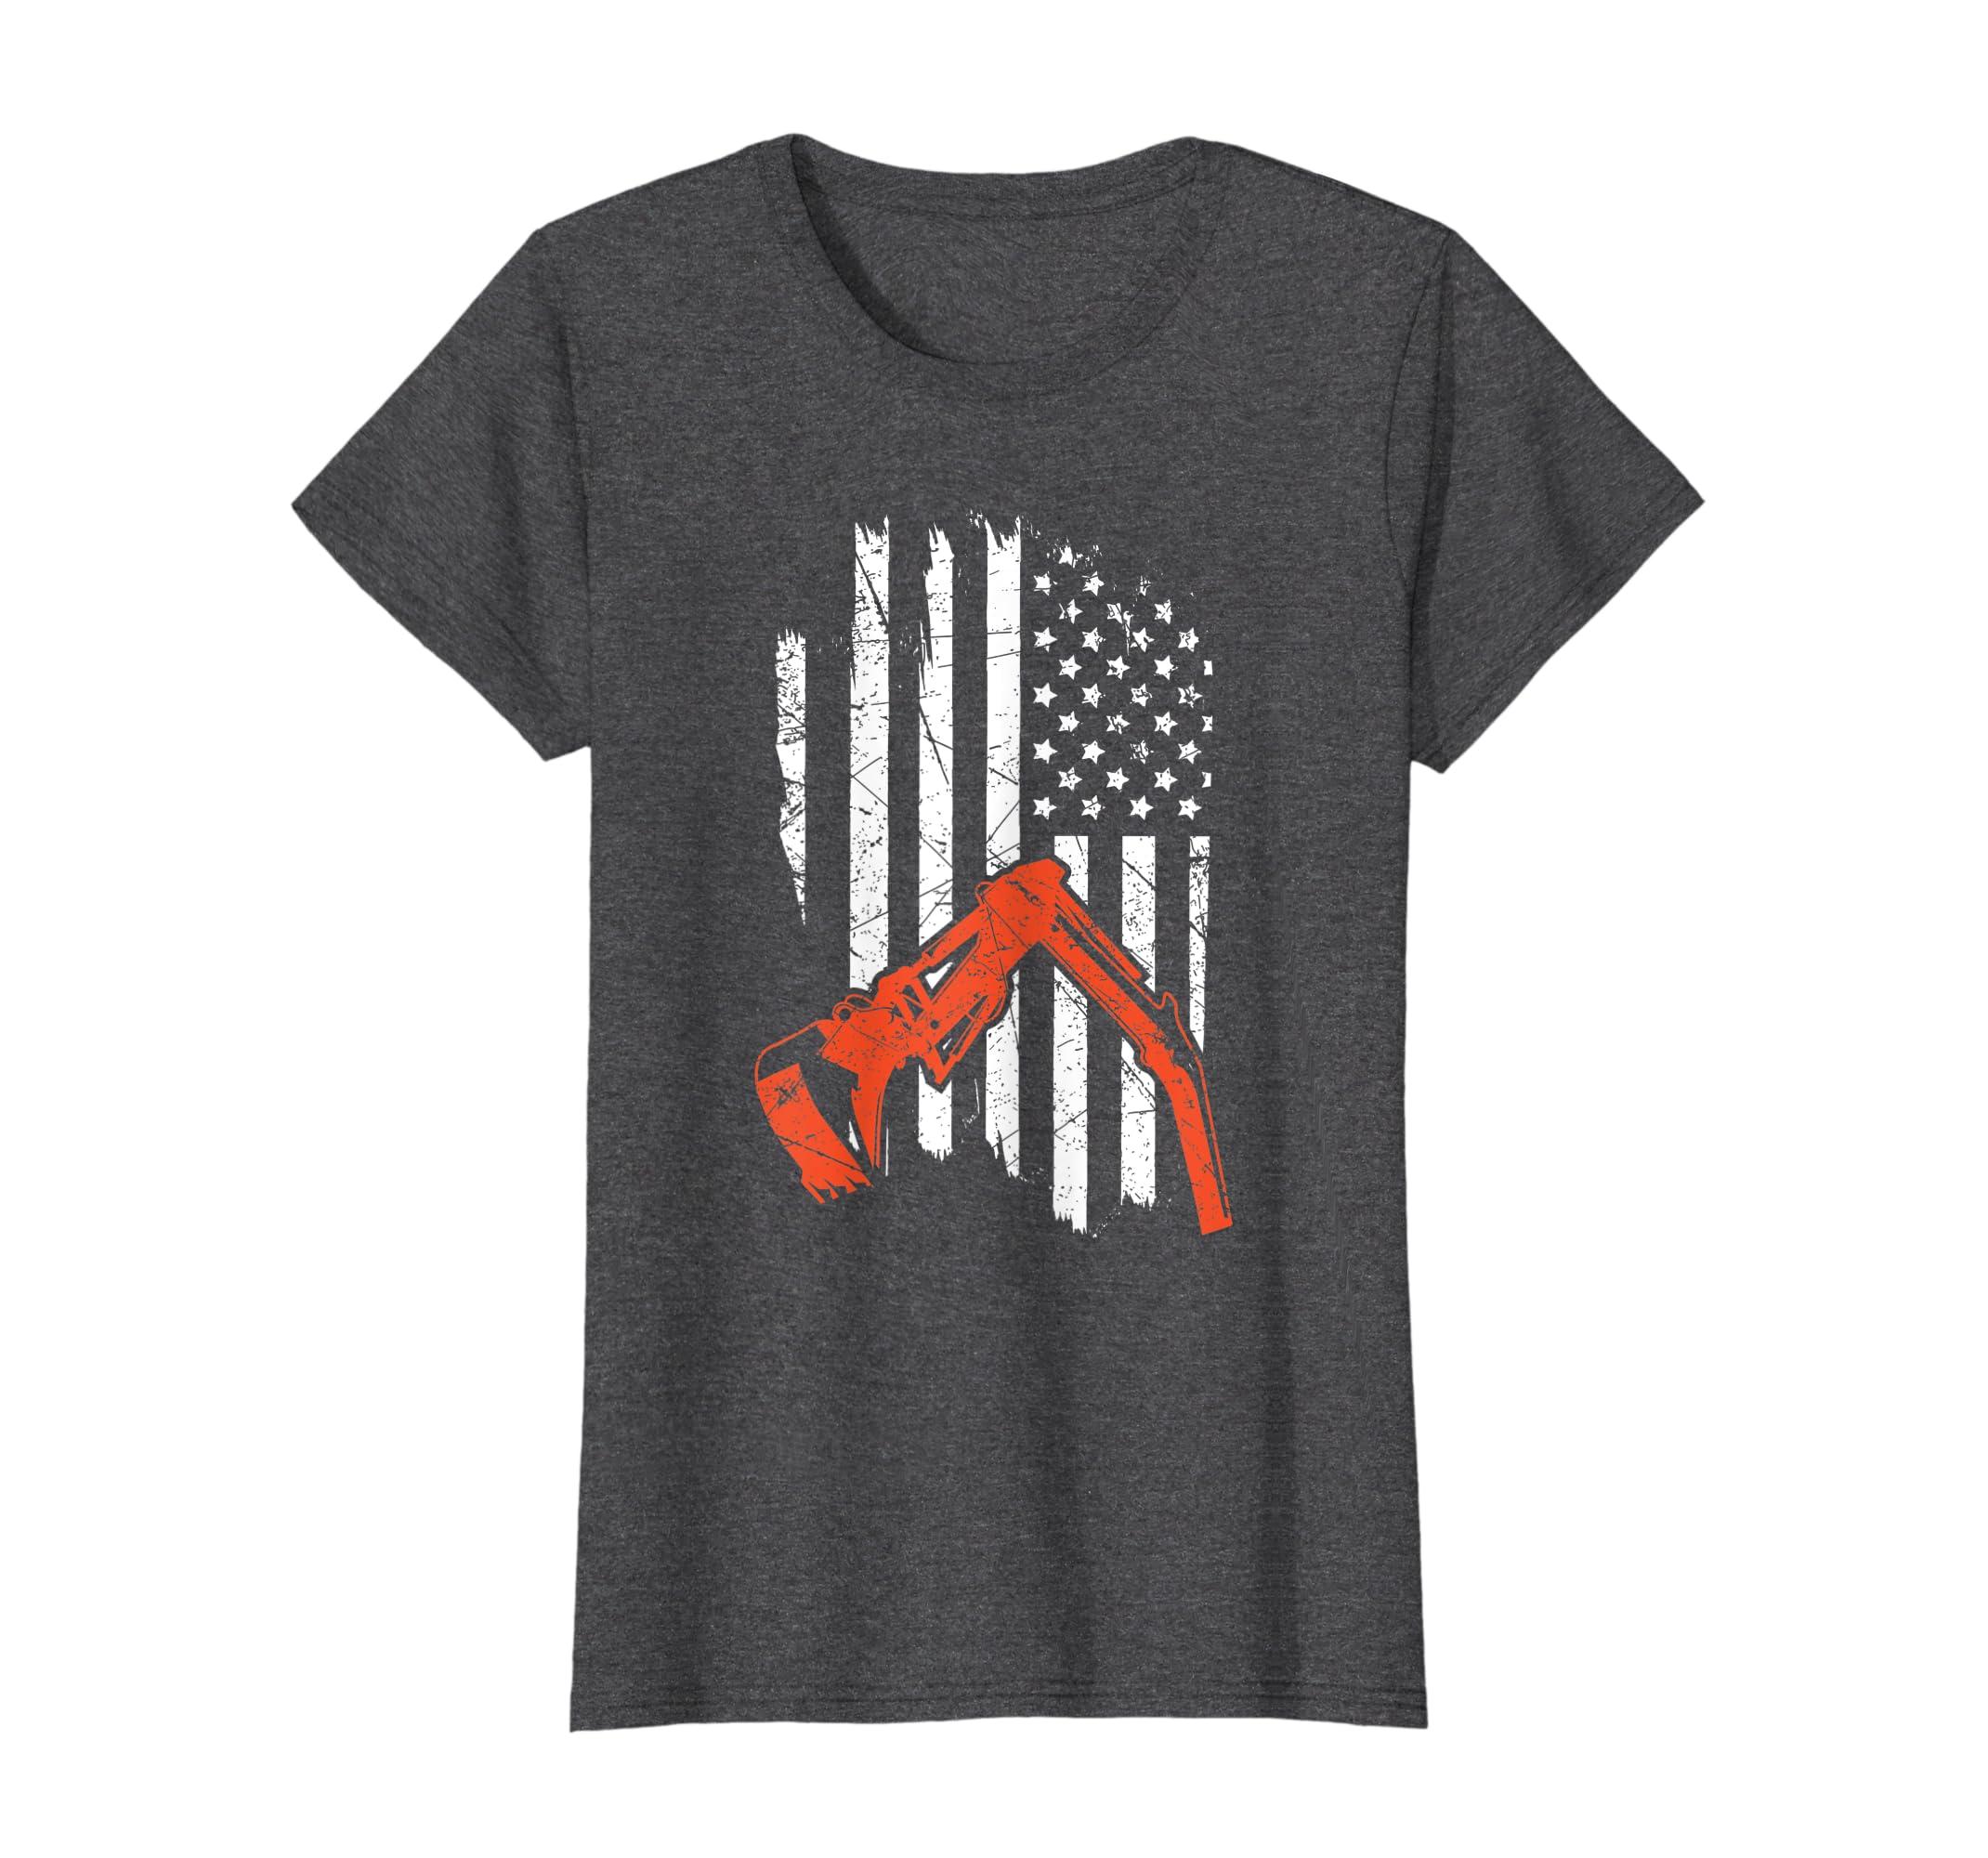 54457ec1 Amazon.com: Funny Heavy Equipment Operator Hoe Operator Usa Flag T Shirt:  Clothing